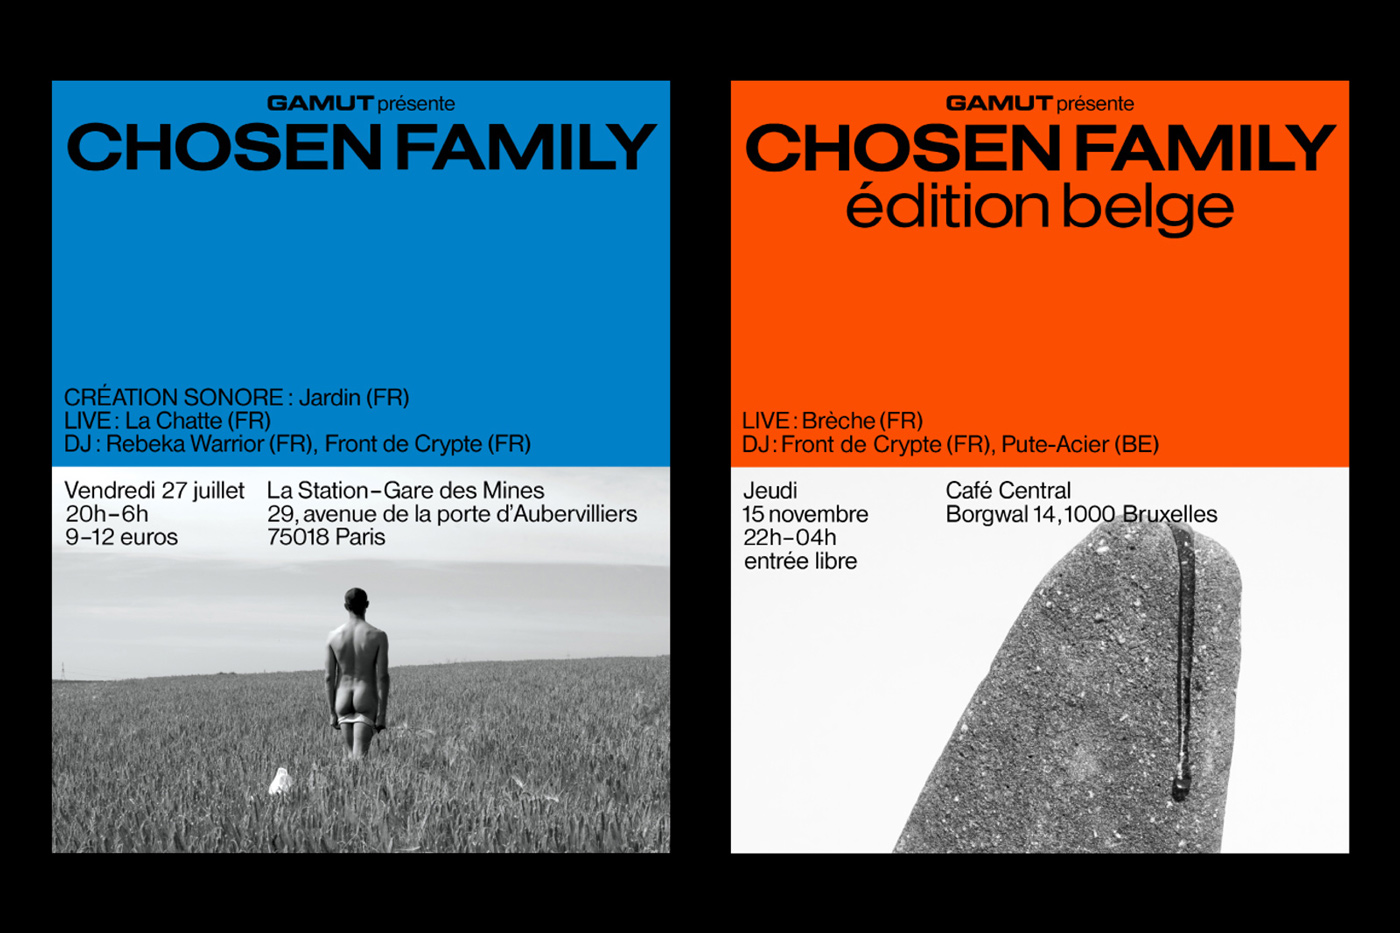 07 collide24 Europium - Europium's collaborative practice explores the relationship between photography and graphic design